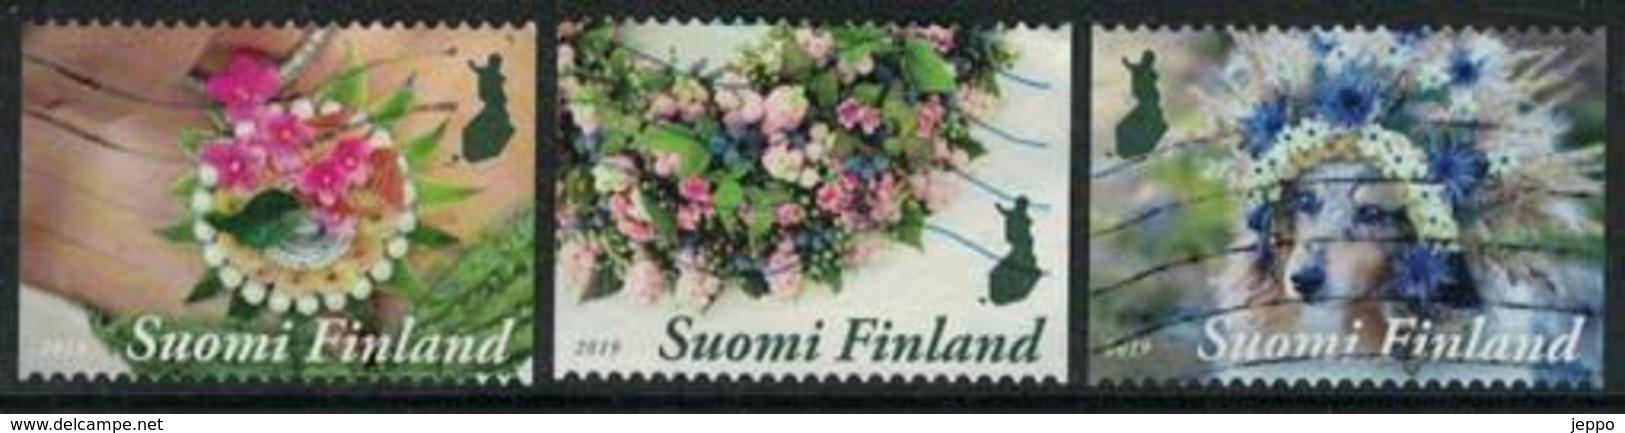 2019 Finland, Floral Artistry, Complete Used Set. - Gebruikt